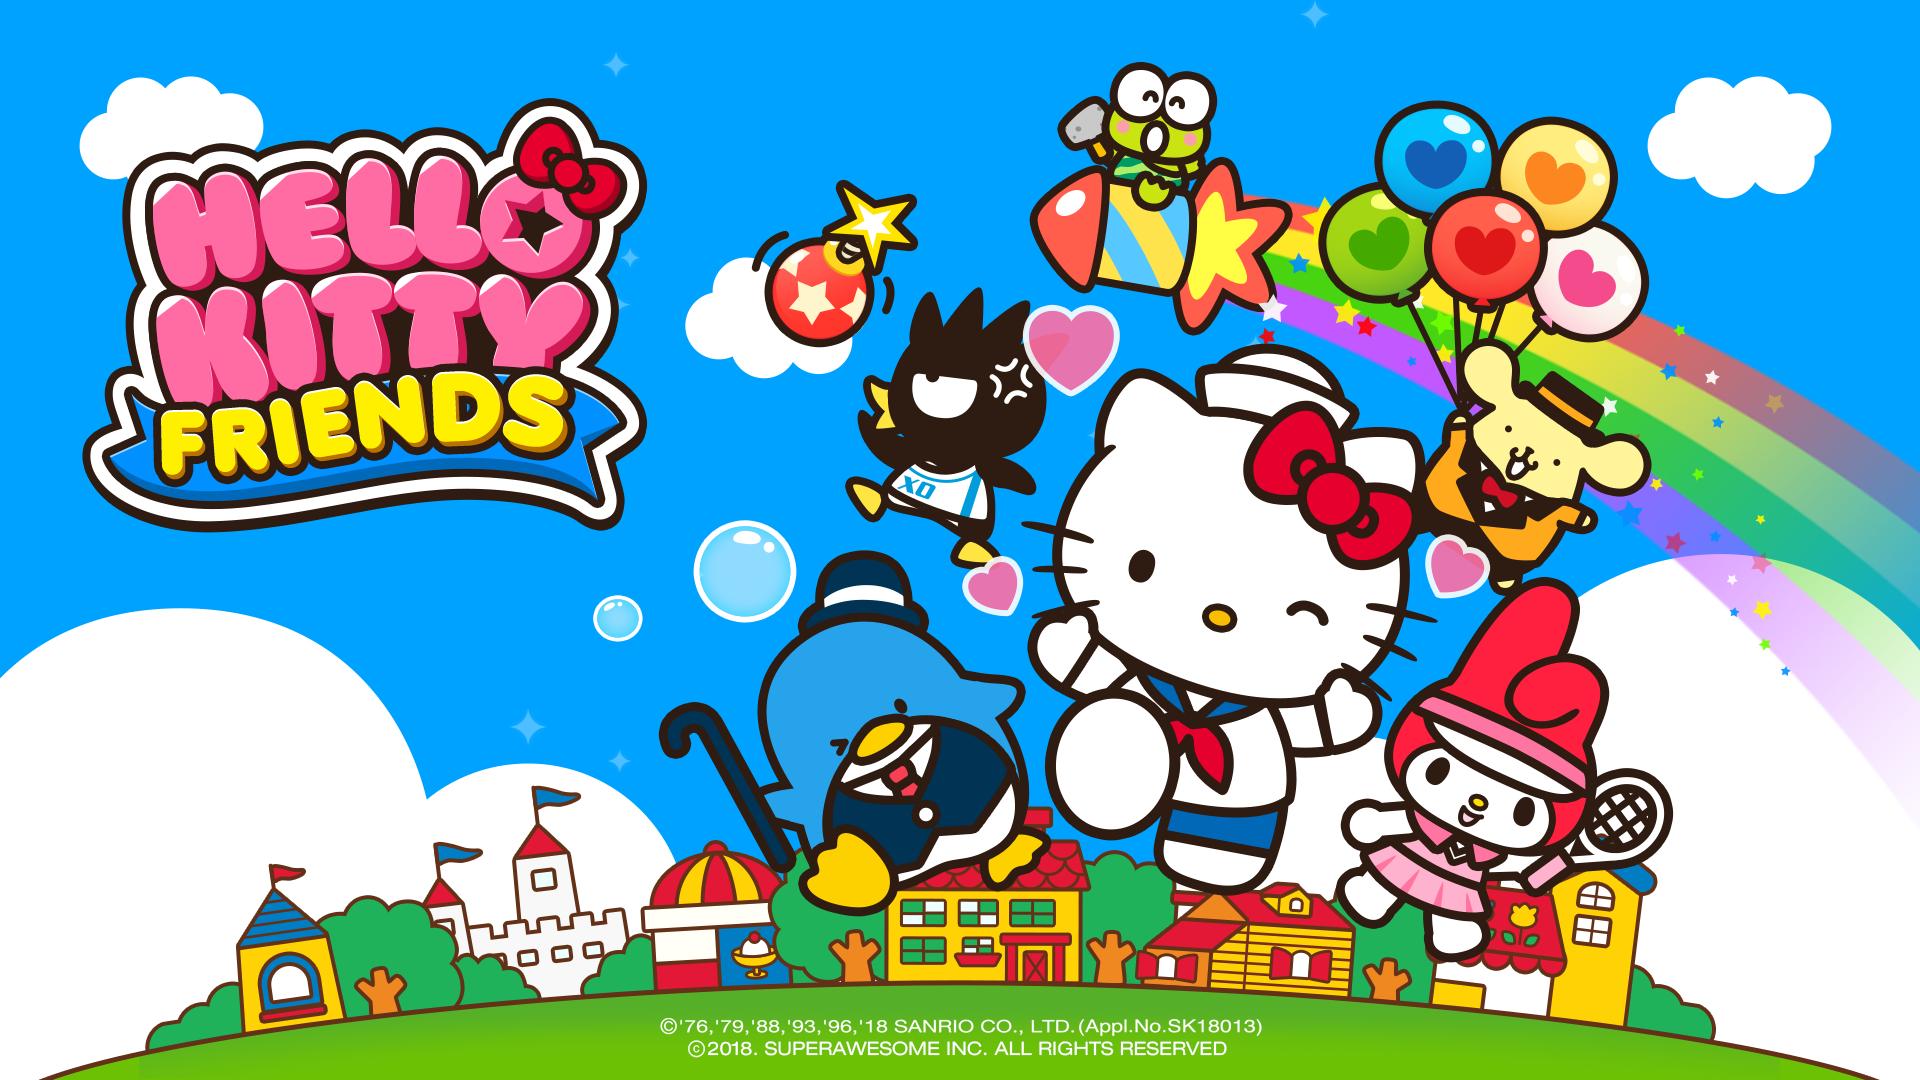 [MWU Korea '18] Hello Kitty Friends